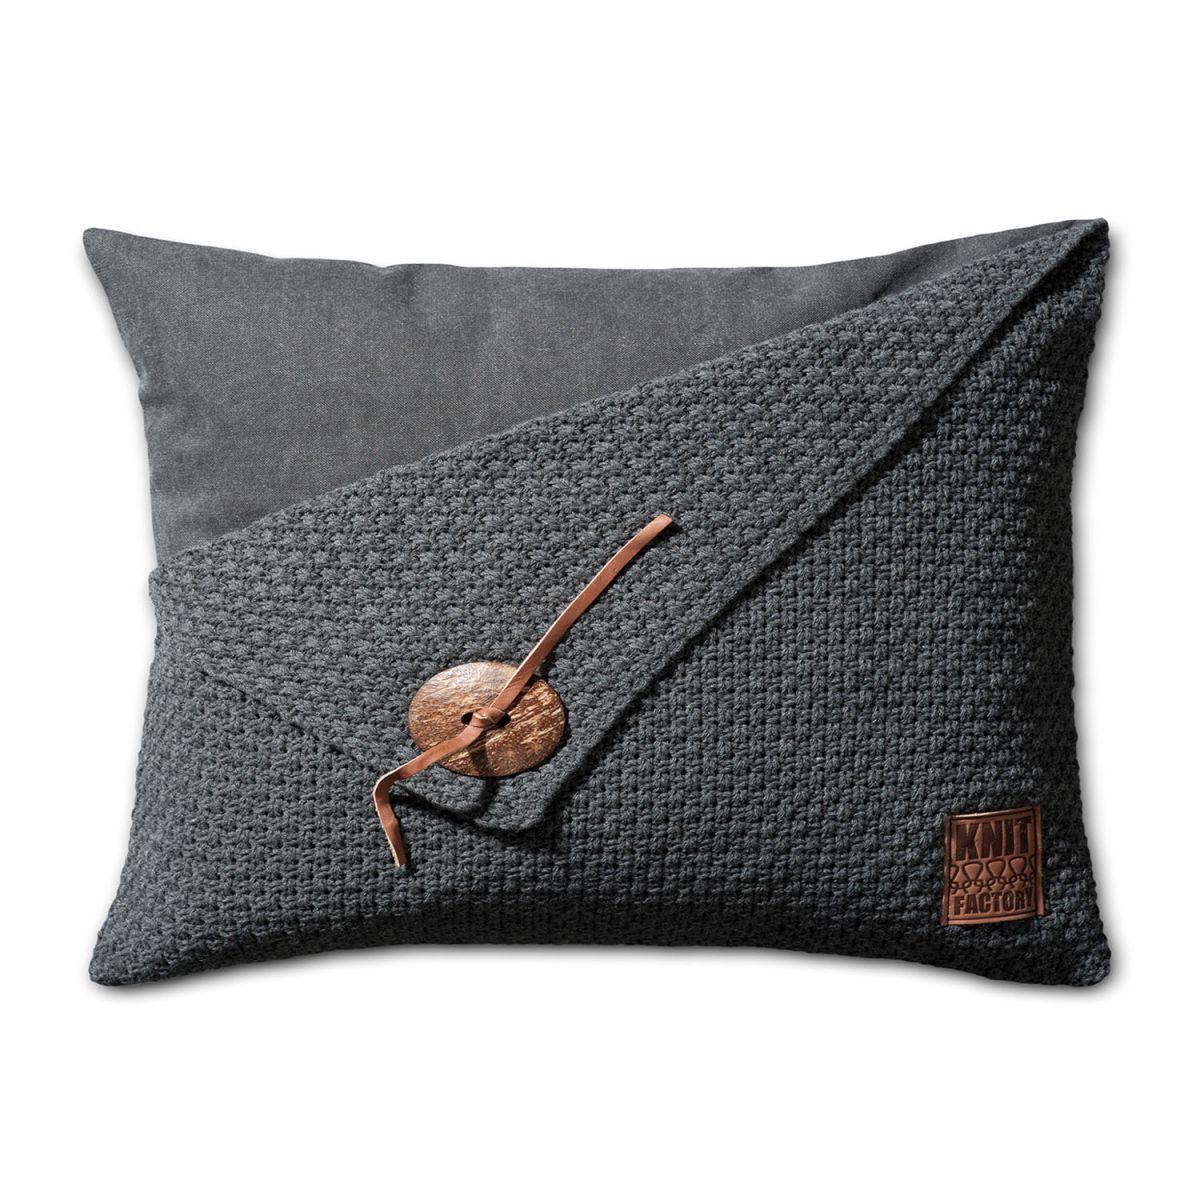 knit factory 1111310 kussen 60x40 barley antraciet